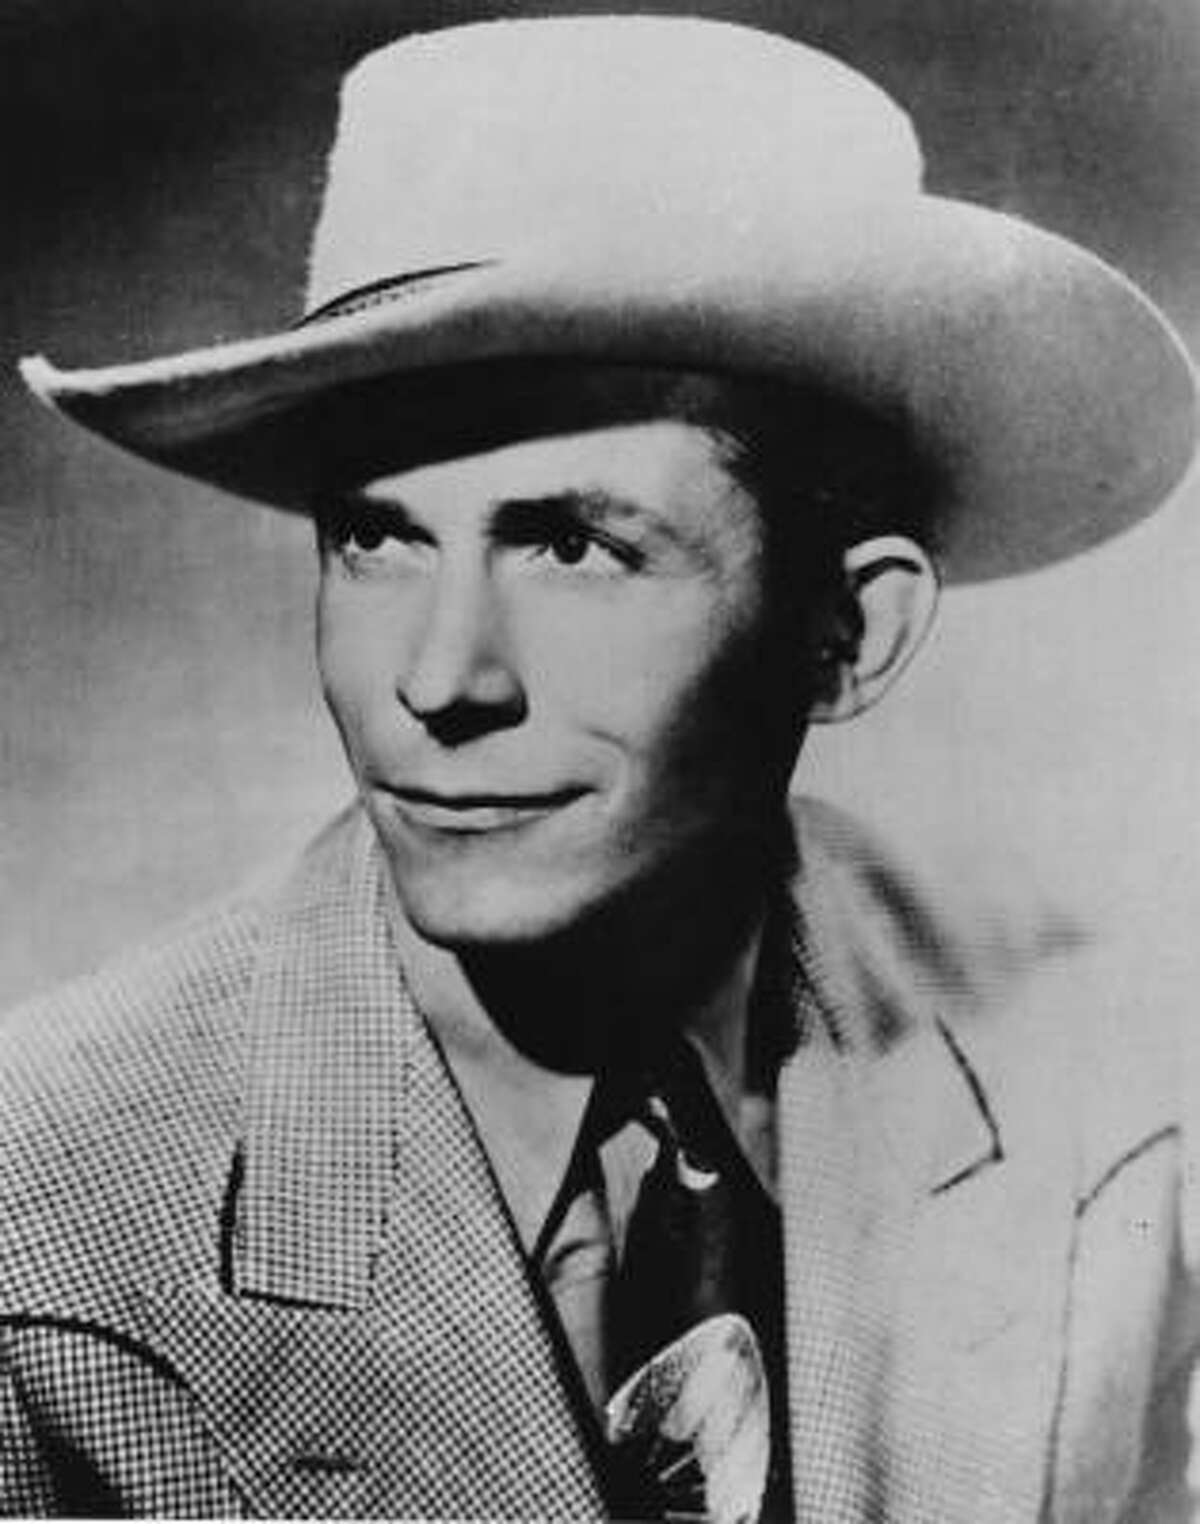 Hank Williams, age 29, heart failure. (Jan. 1, 1953)